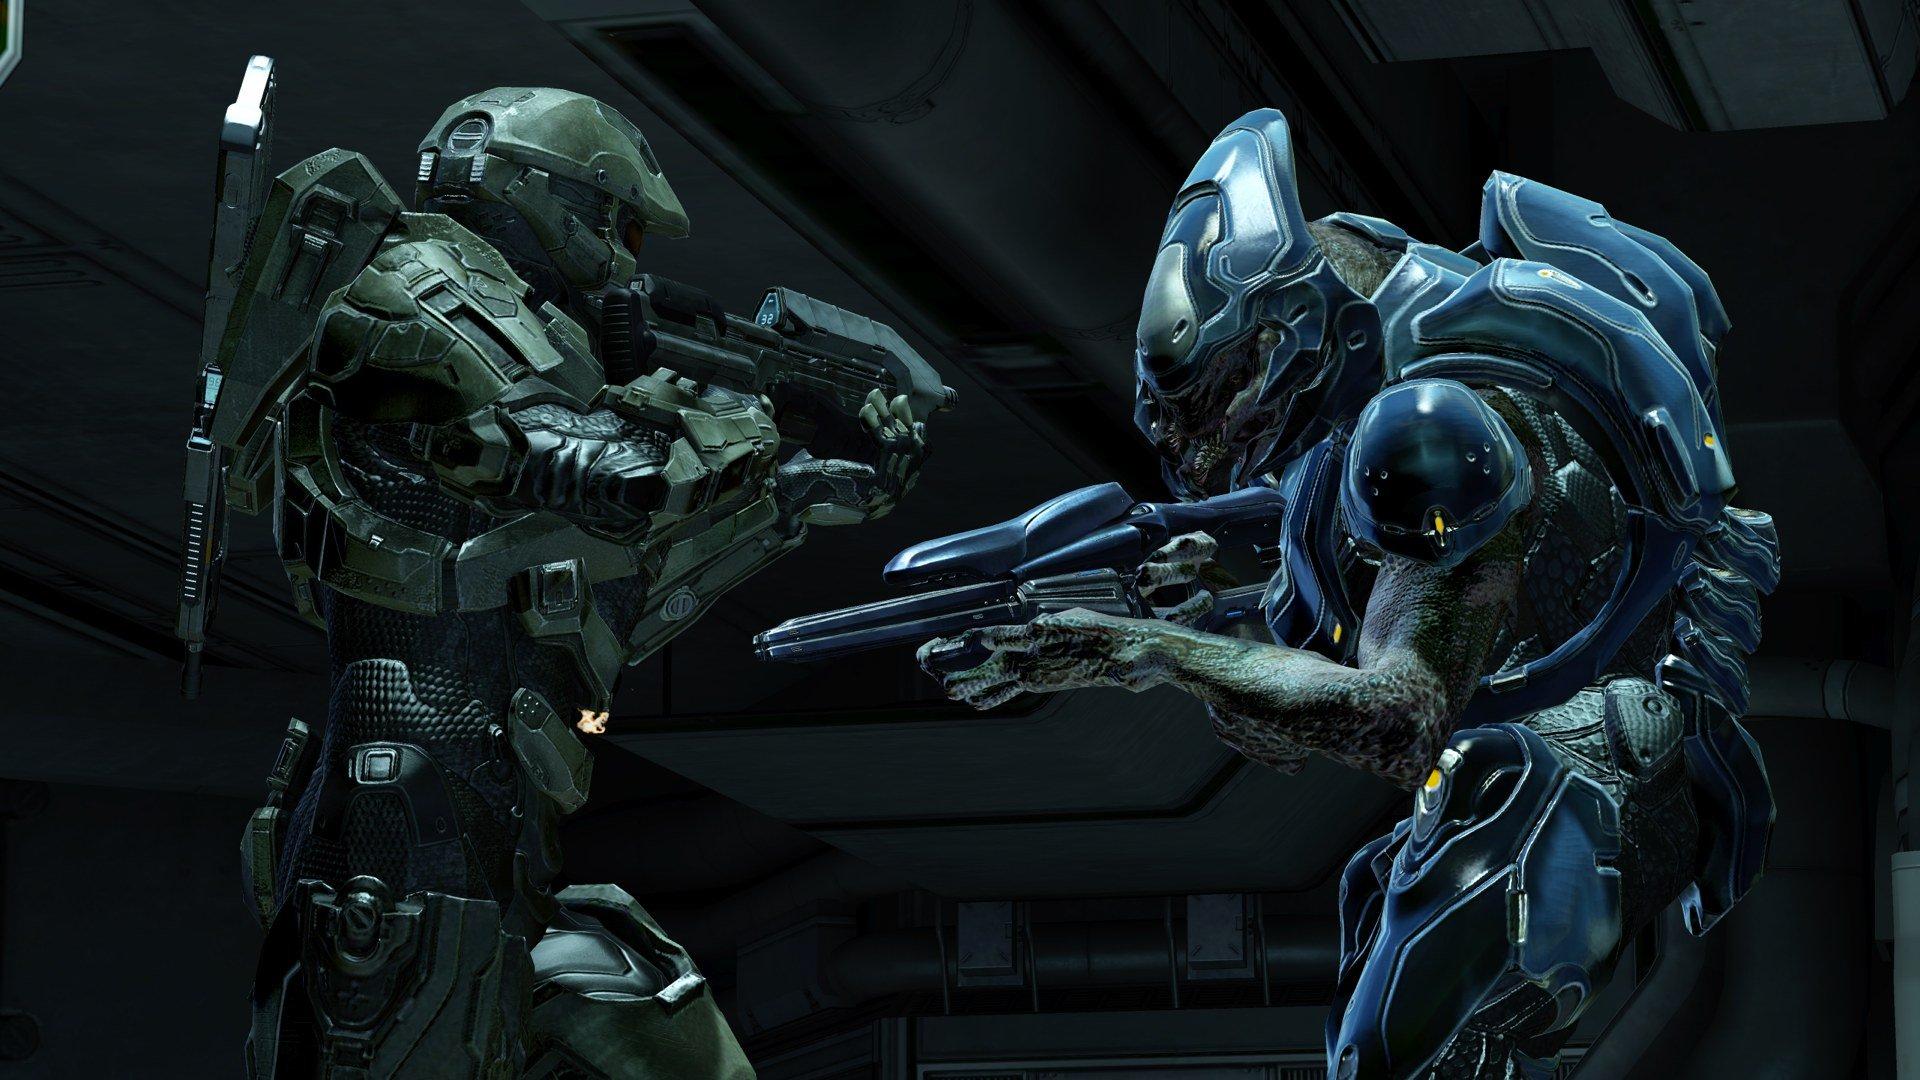 Halo4 360 Editeur 021